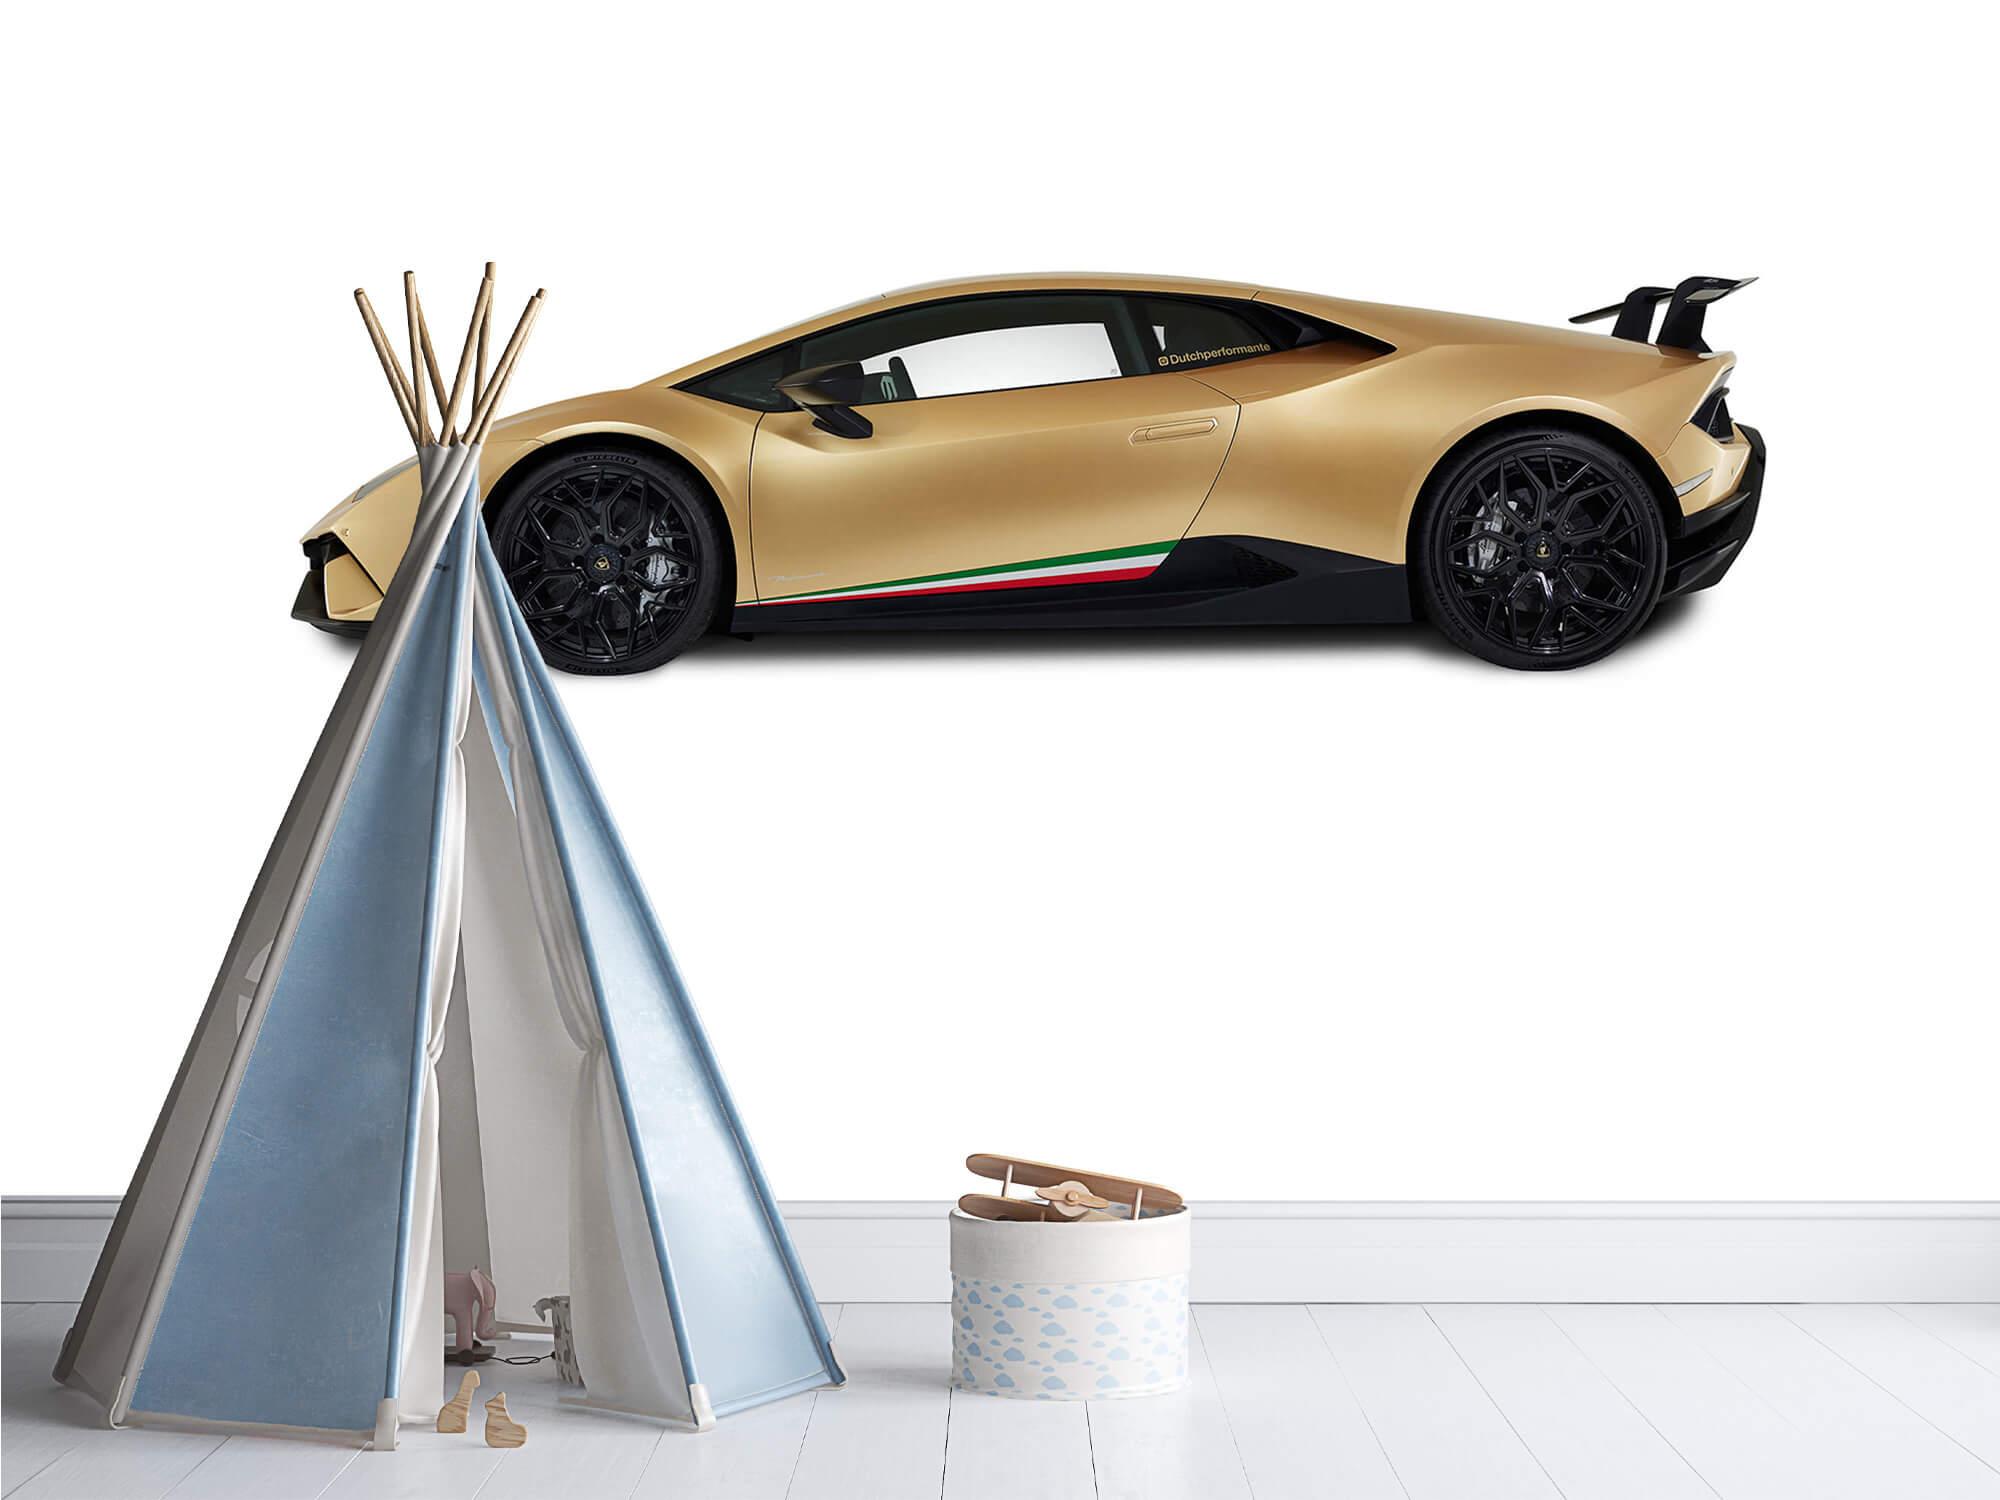 Wallpaper Lamborghini Huracán - Zijkant, wit 4